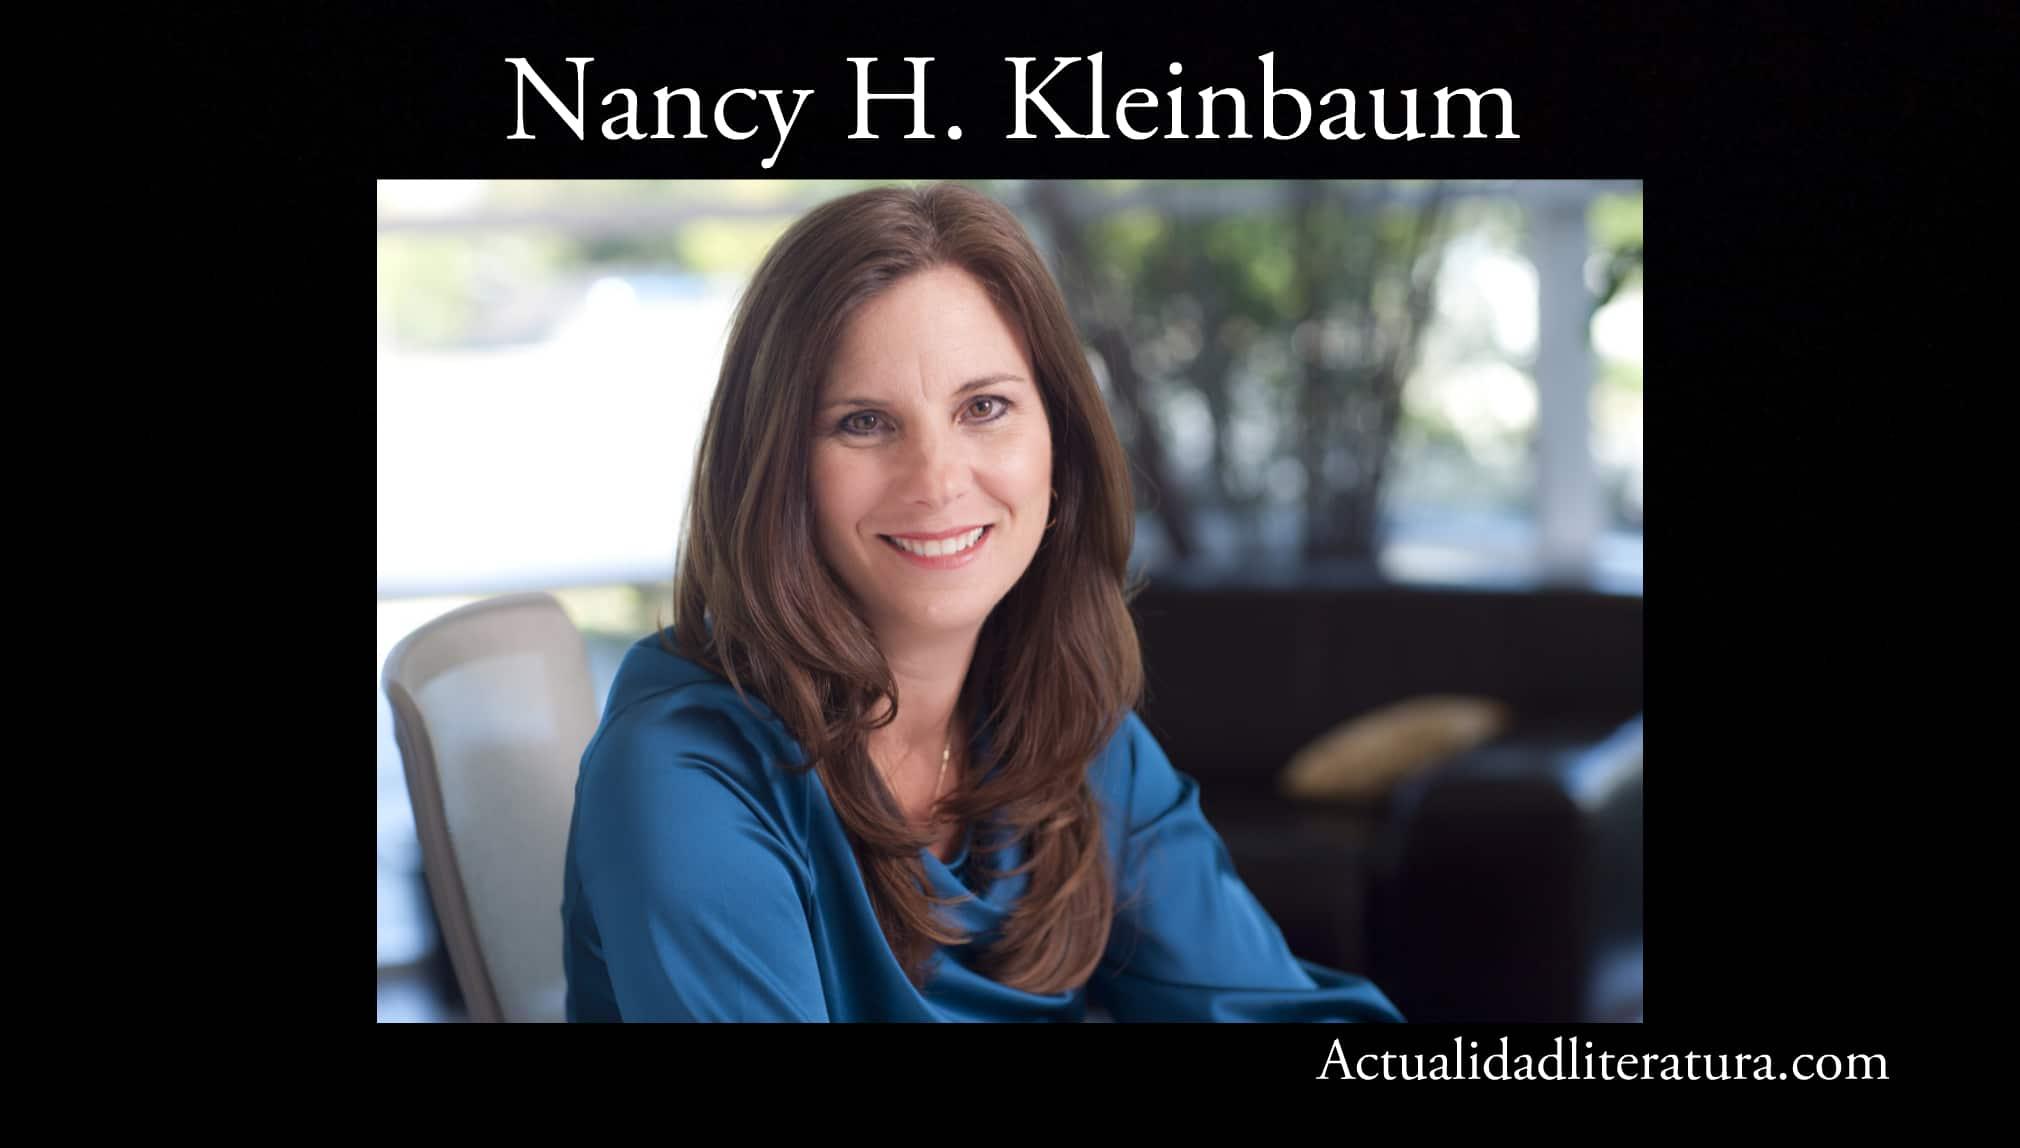 Nancy H. Kleinbaum.